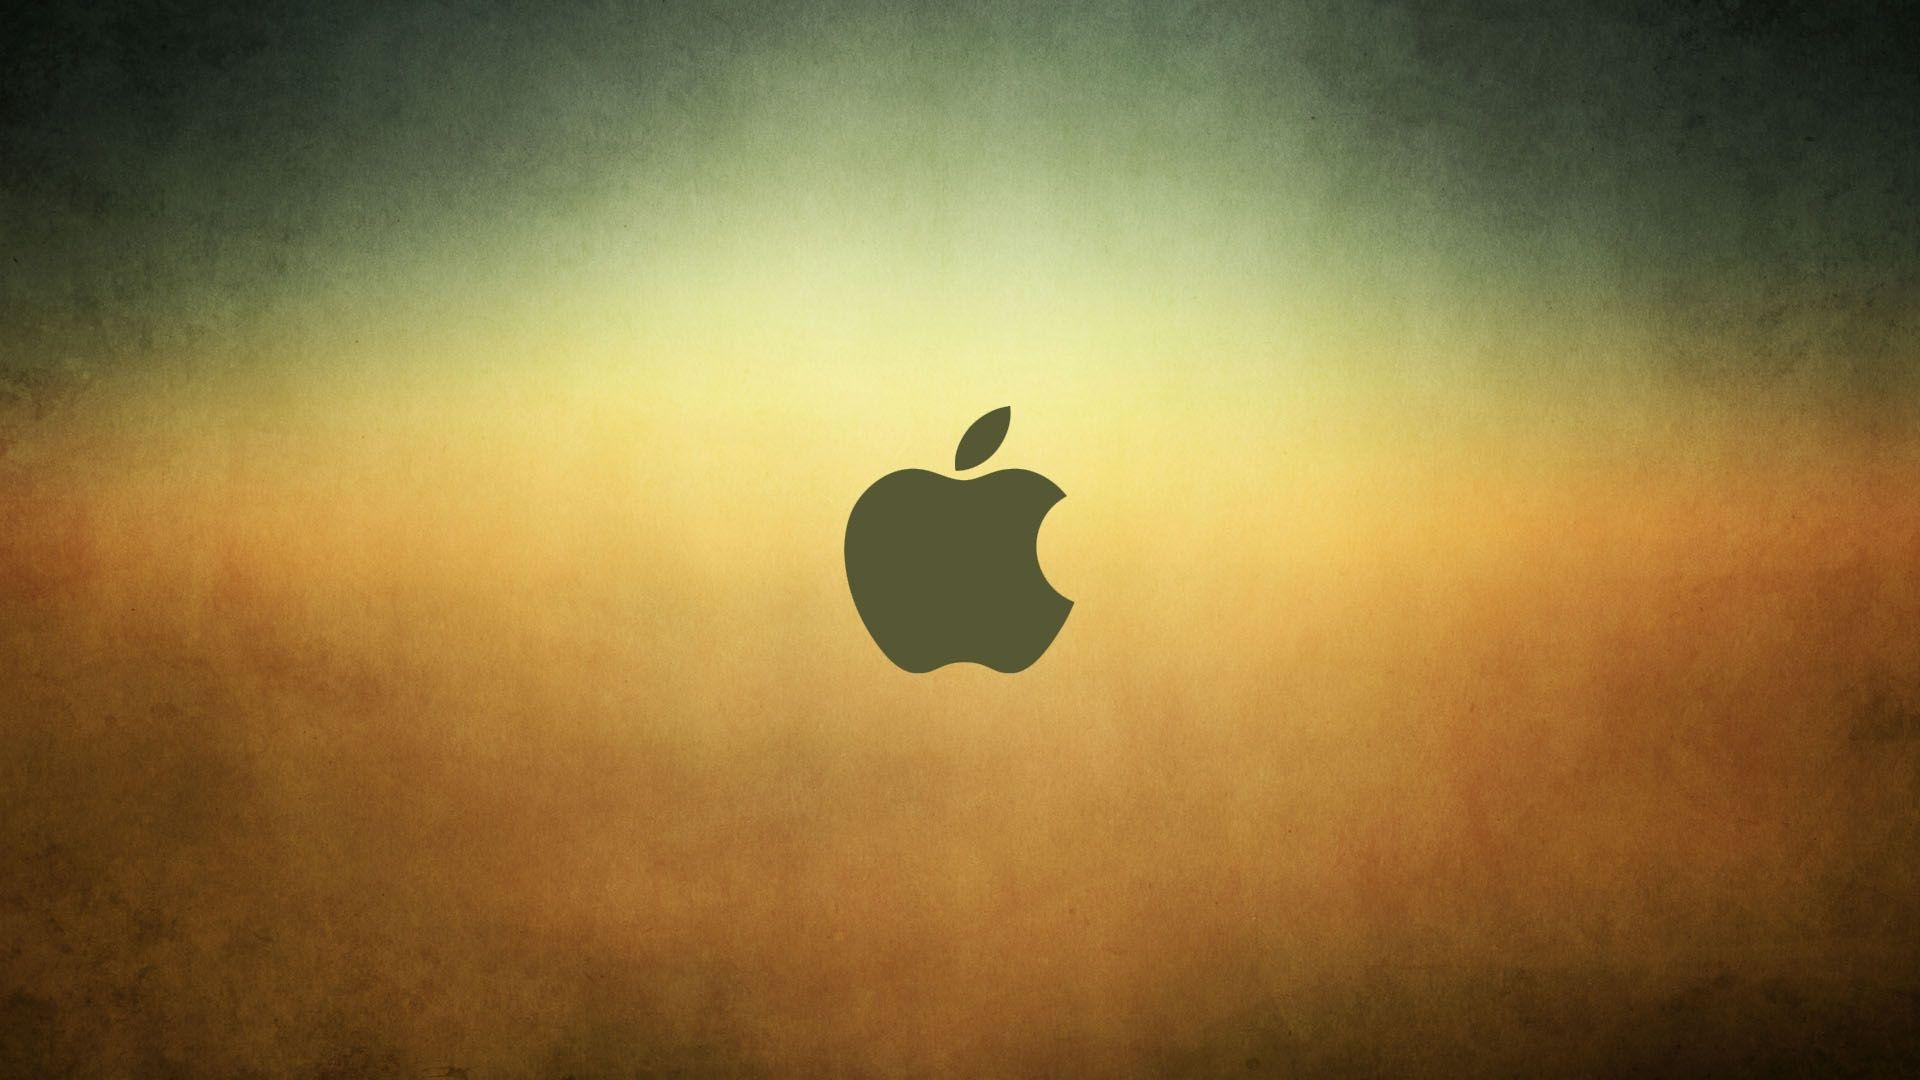 apple wallpaper hd maldives - photo #33